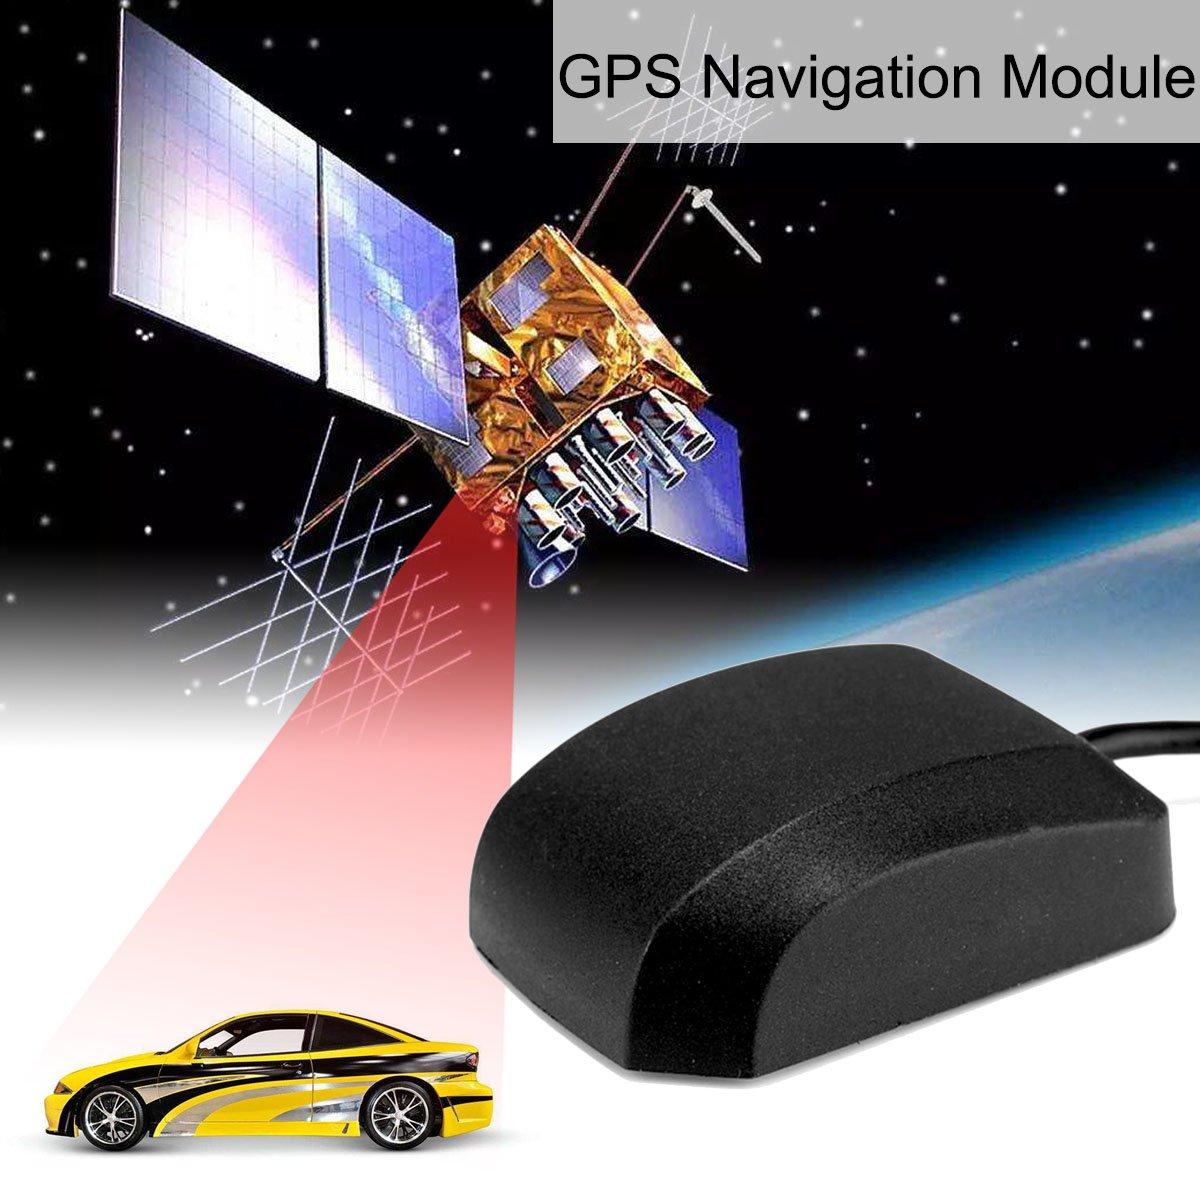 Moligh doll VK-162 Soporte de modulo de navegacion GPS USB de Ordenador portatil